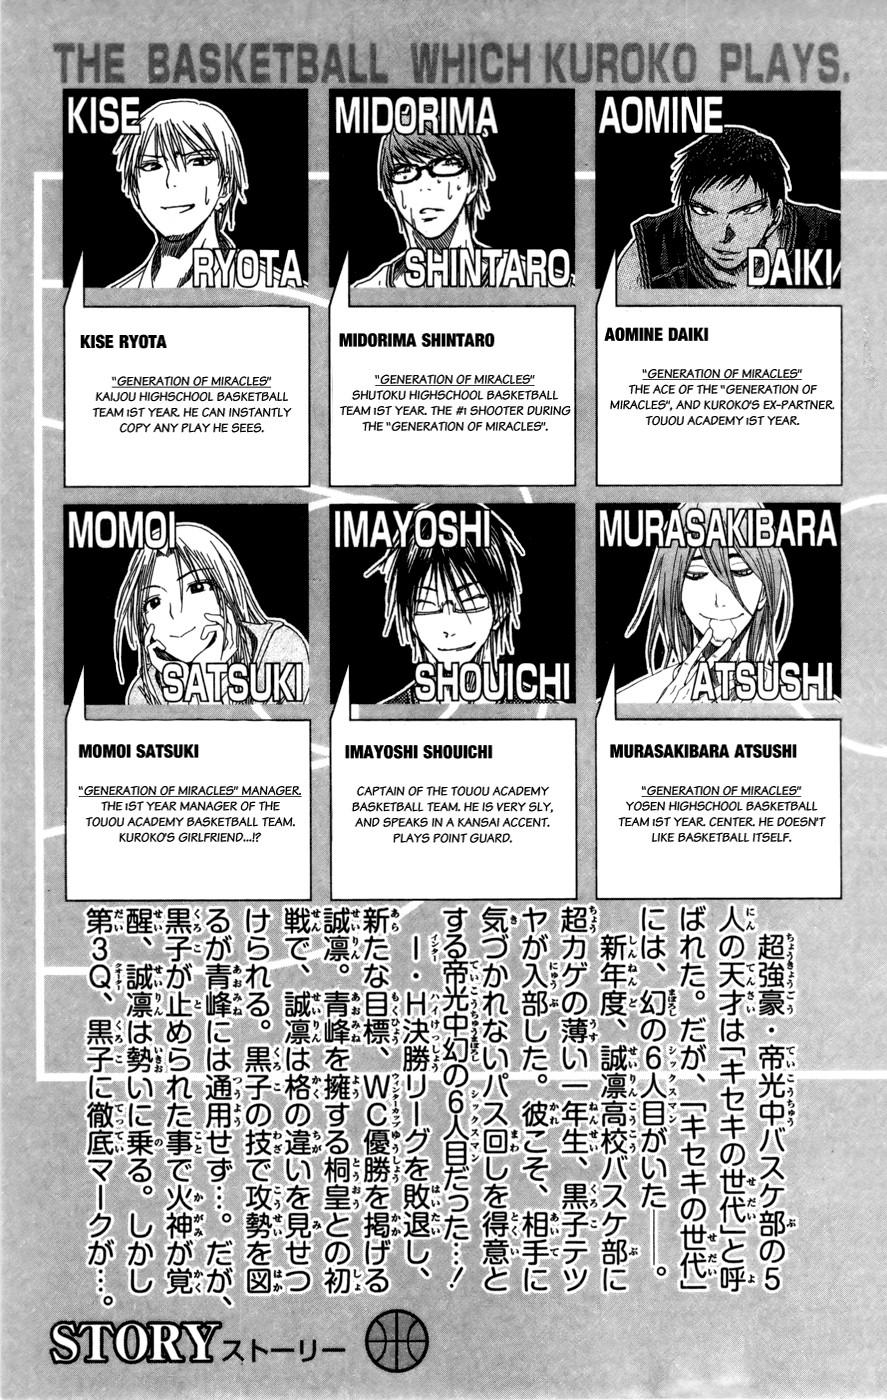 Kuroko no Basket Manga Chapter 127 - Image 05